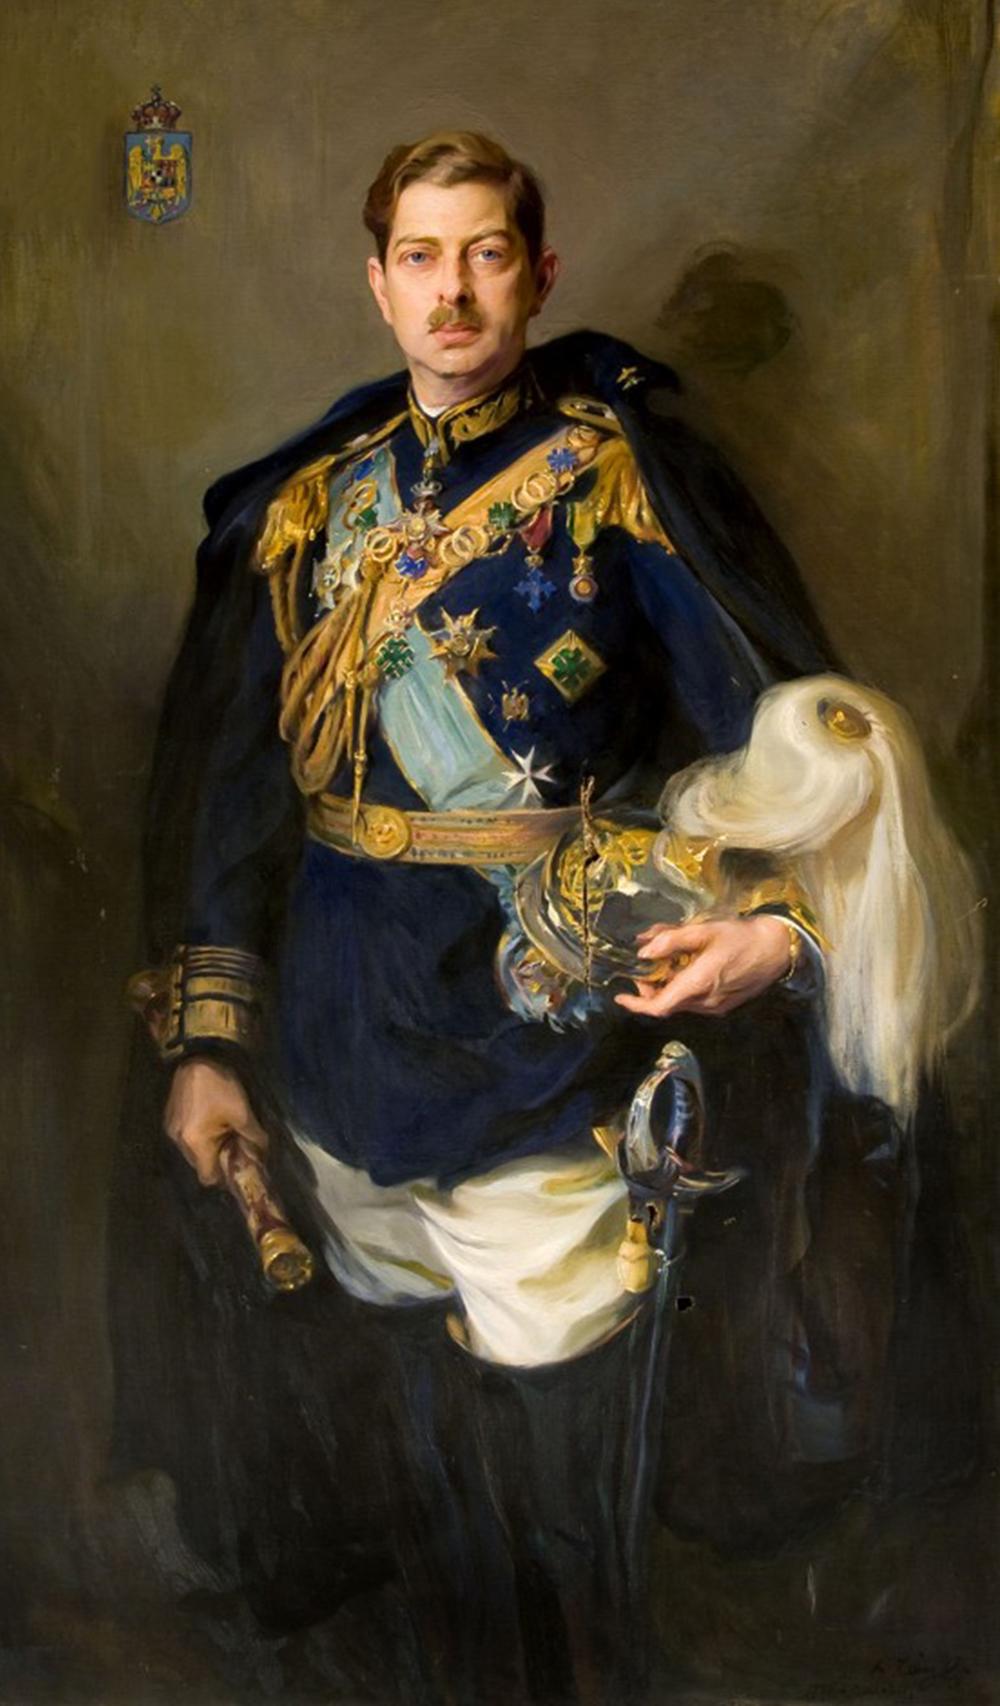 Carol I of Romania